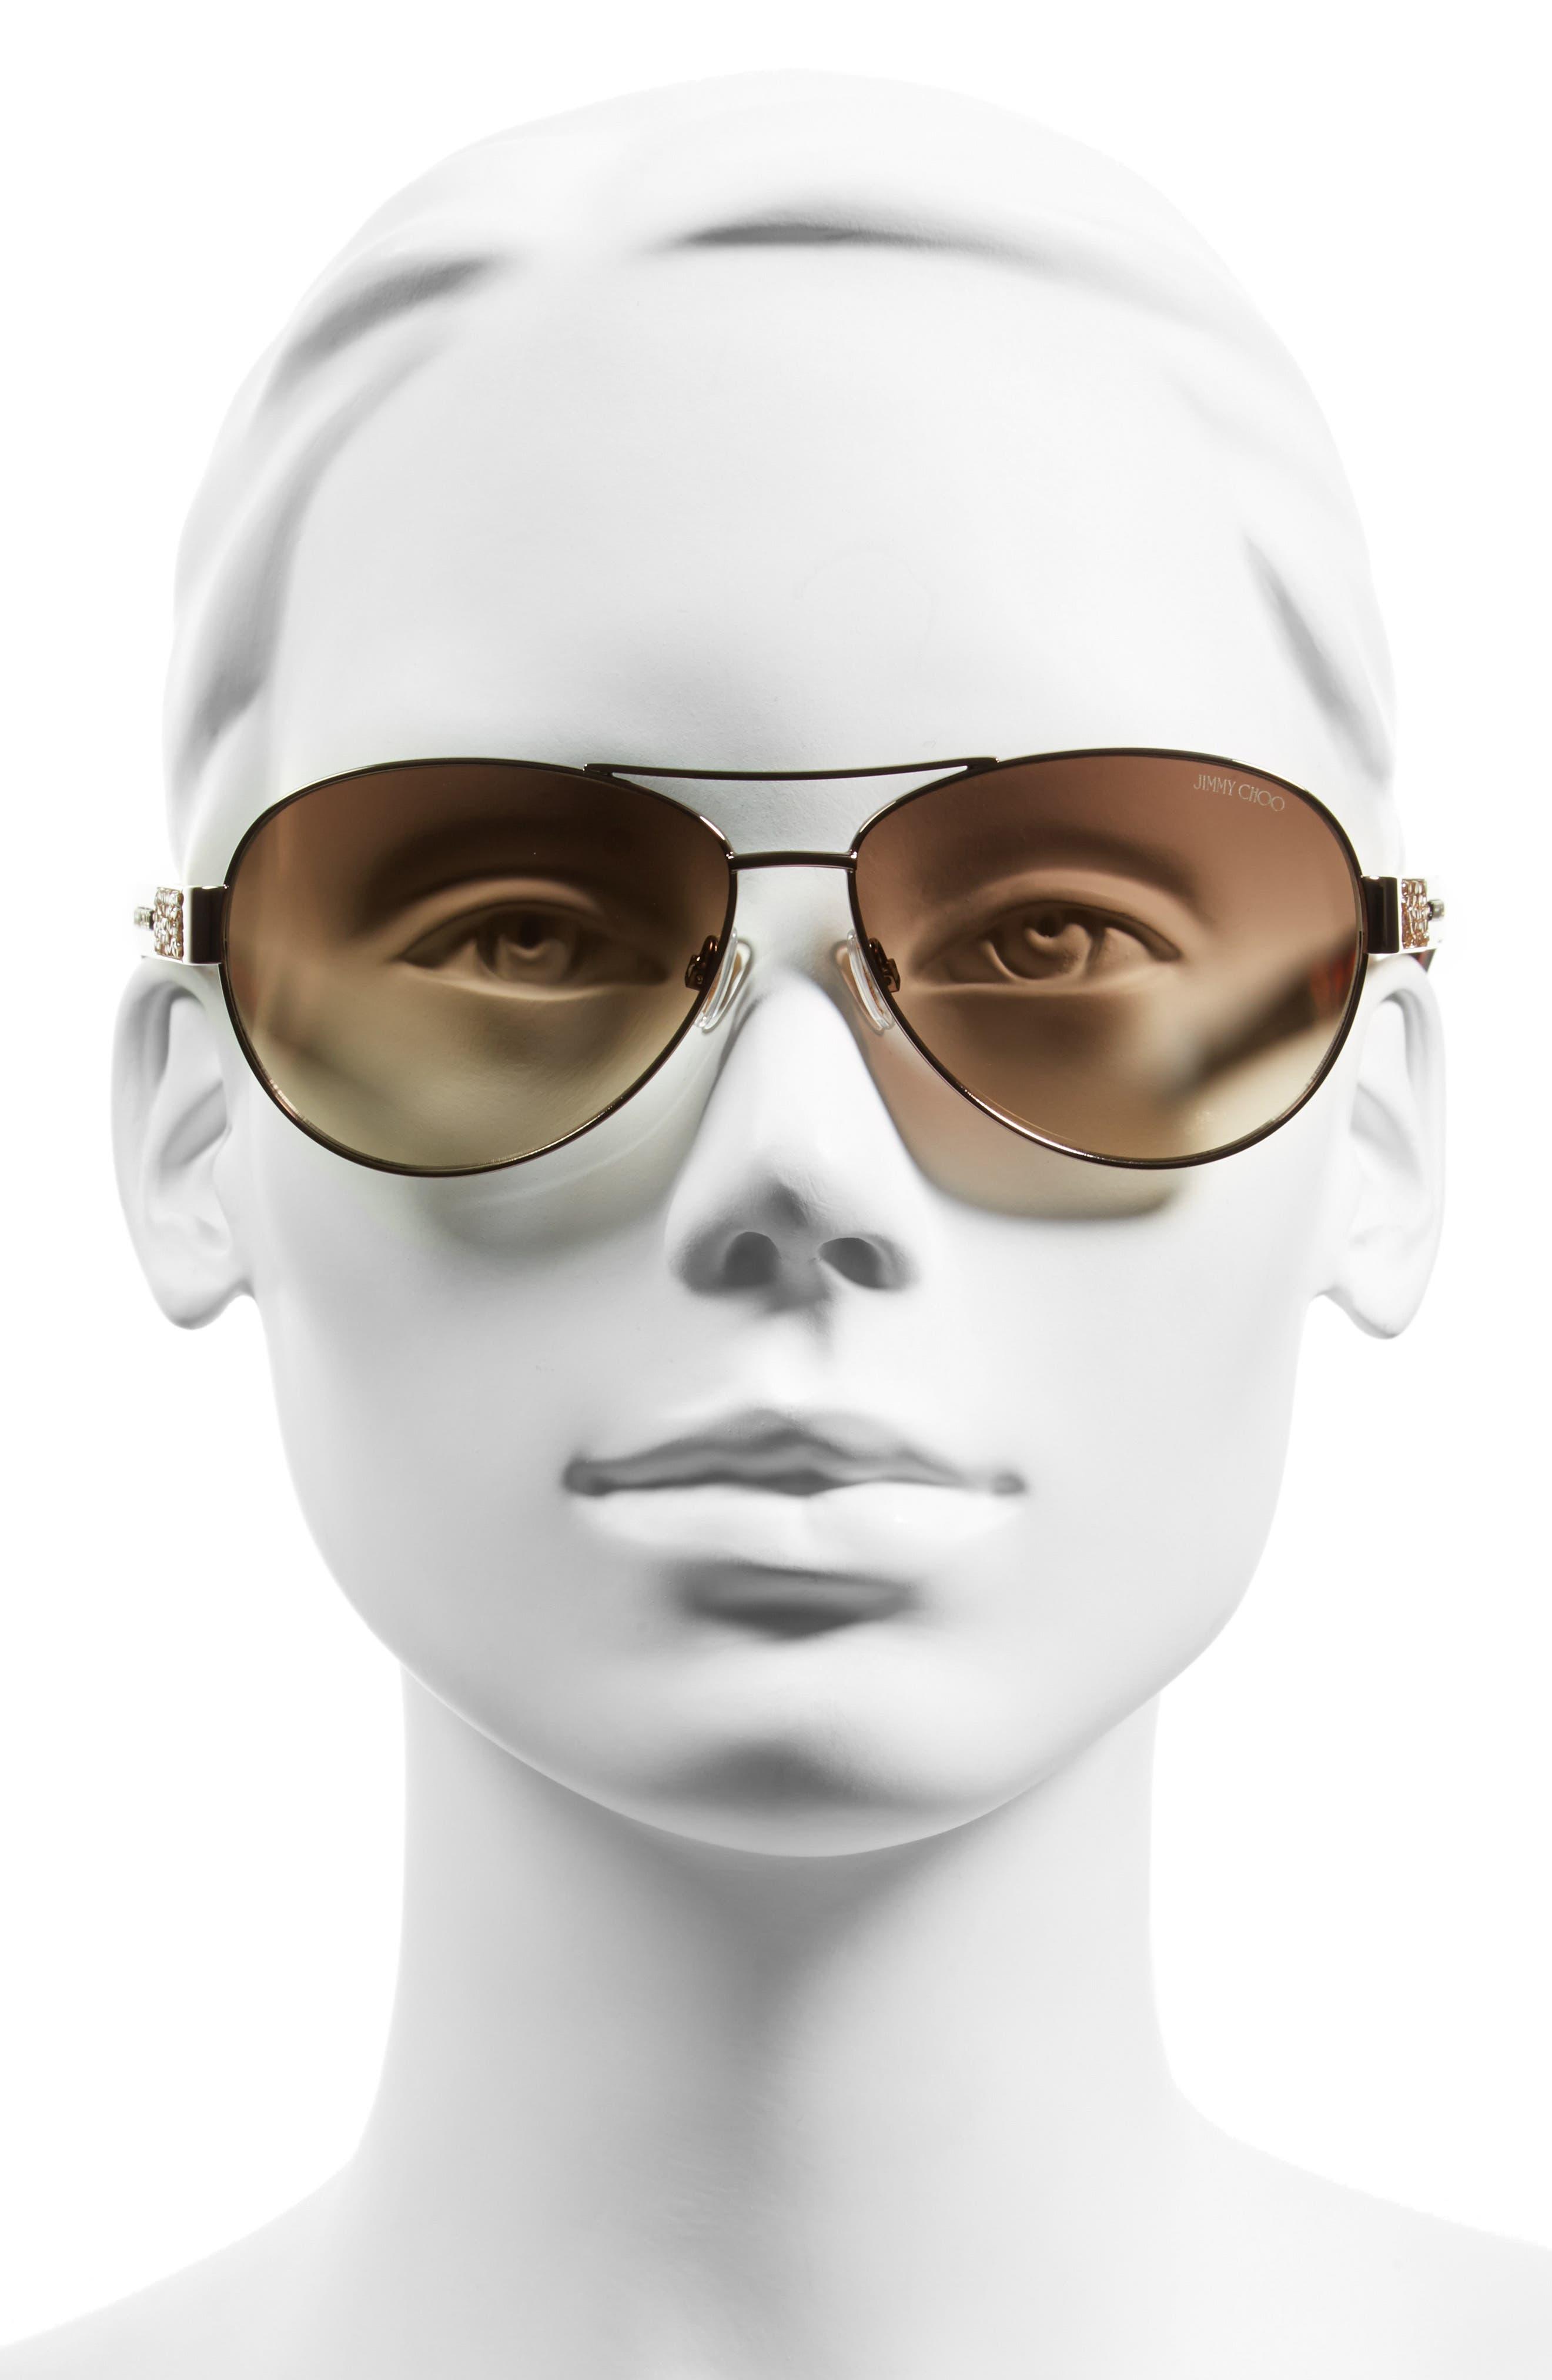 JIMMY CHOO,                             'Babas' 59mm Aviator Sunglasses,                             Alternate thumbnail 4, color,                             200